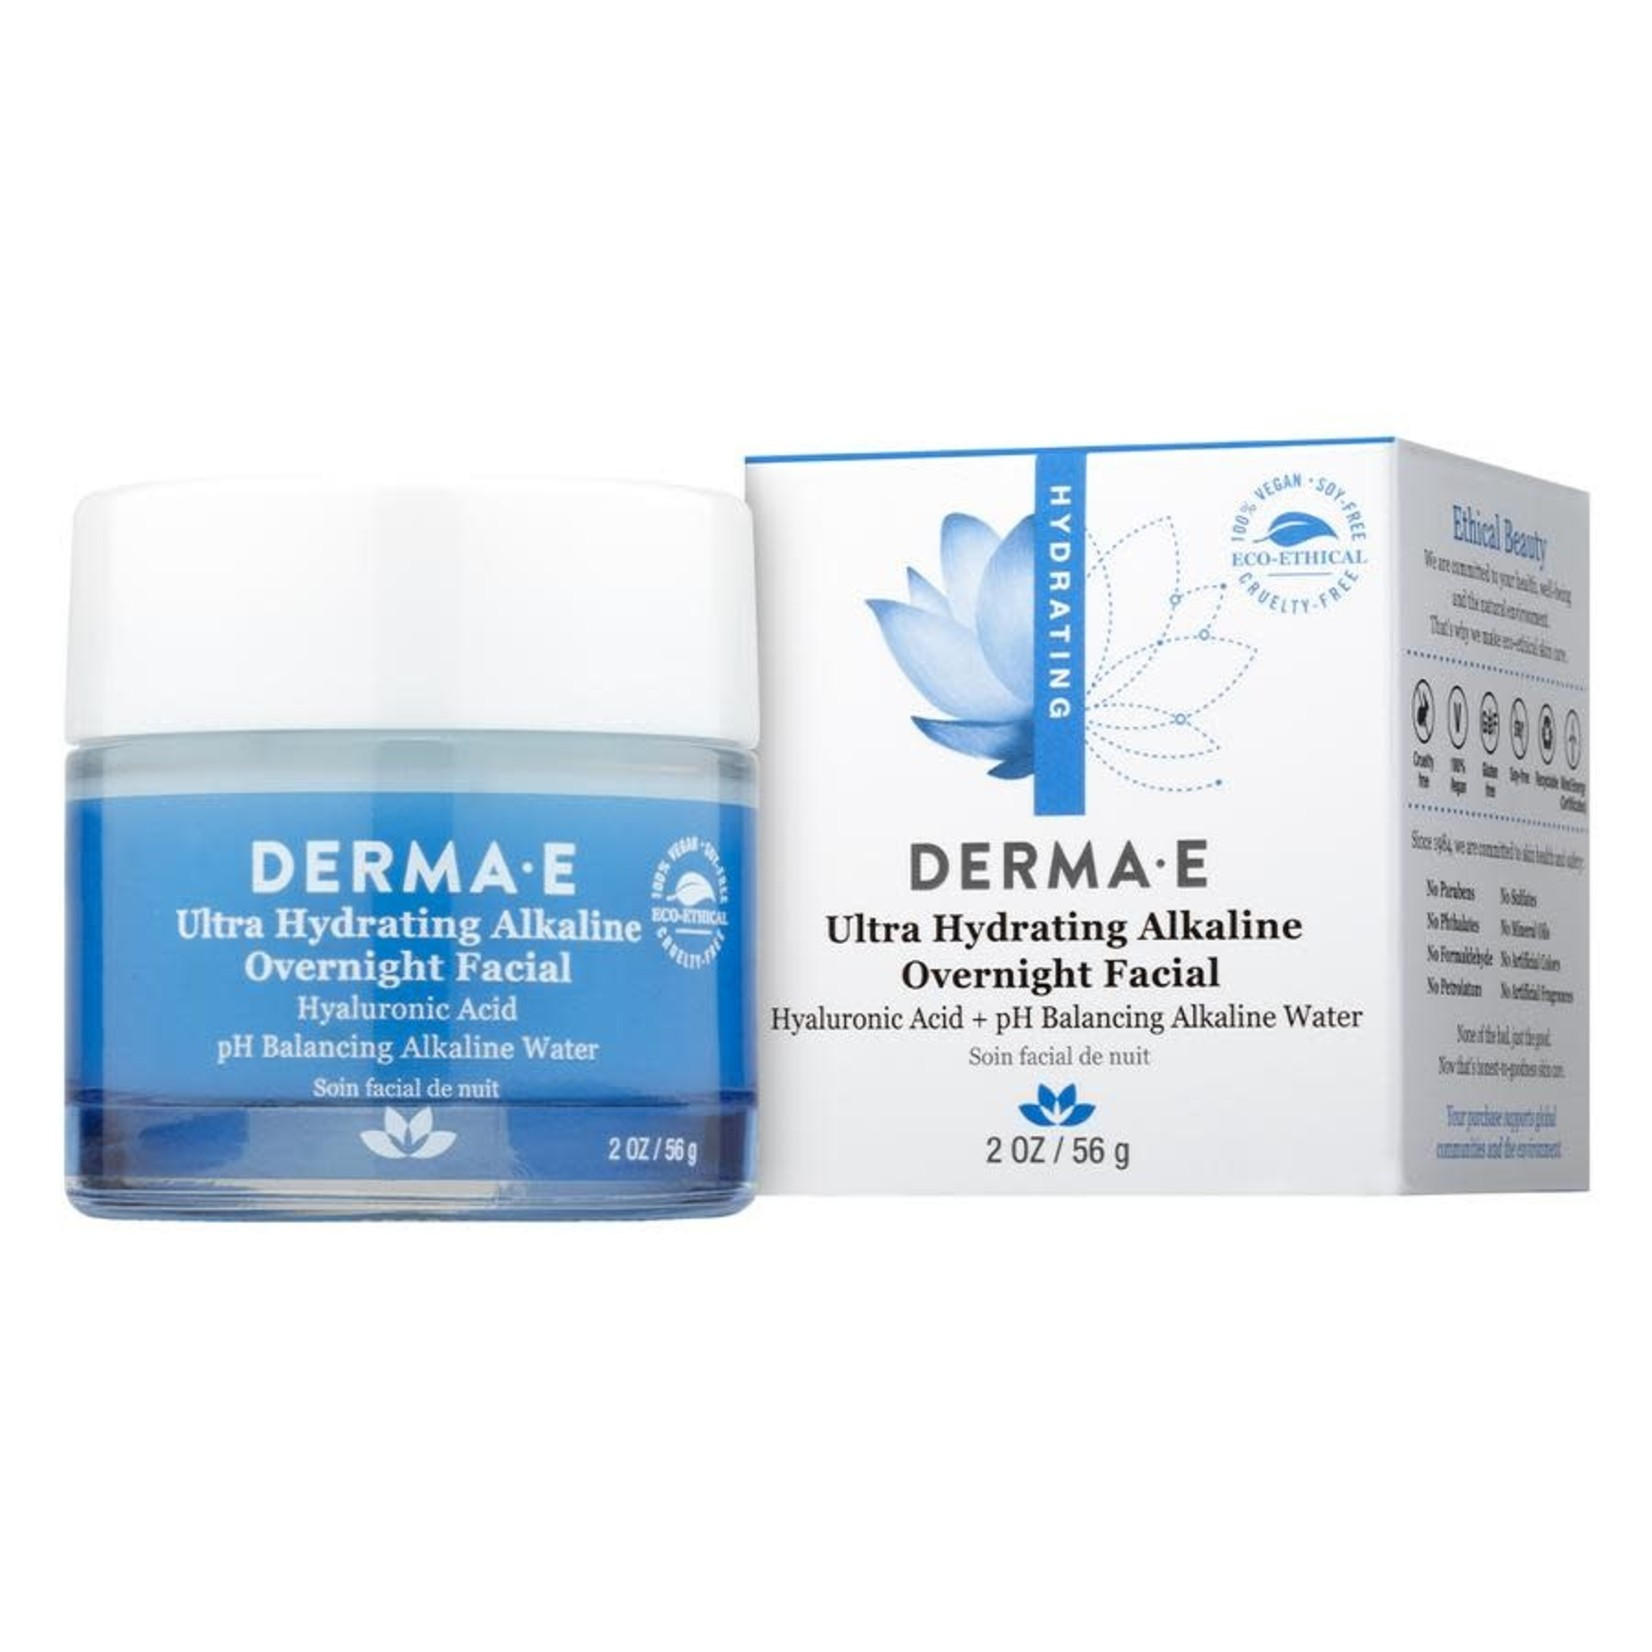 Derma E Derma E Ultra Hydrating Alkaline Overnight Facial 56g